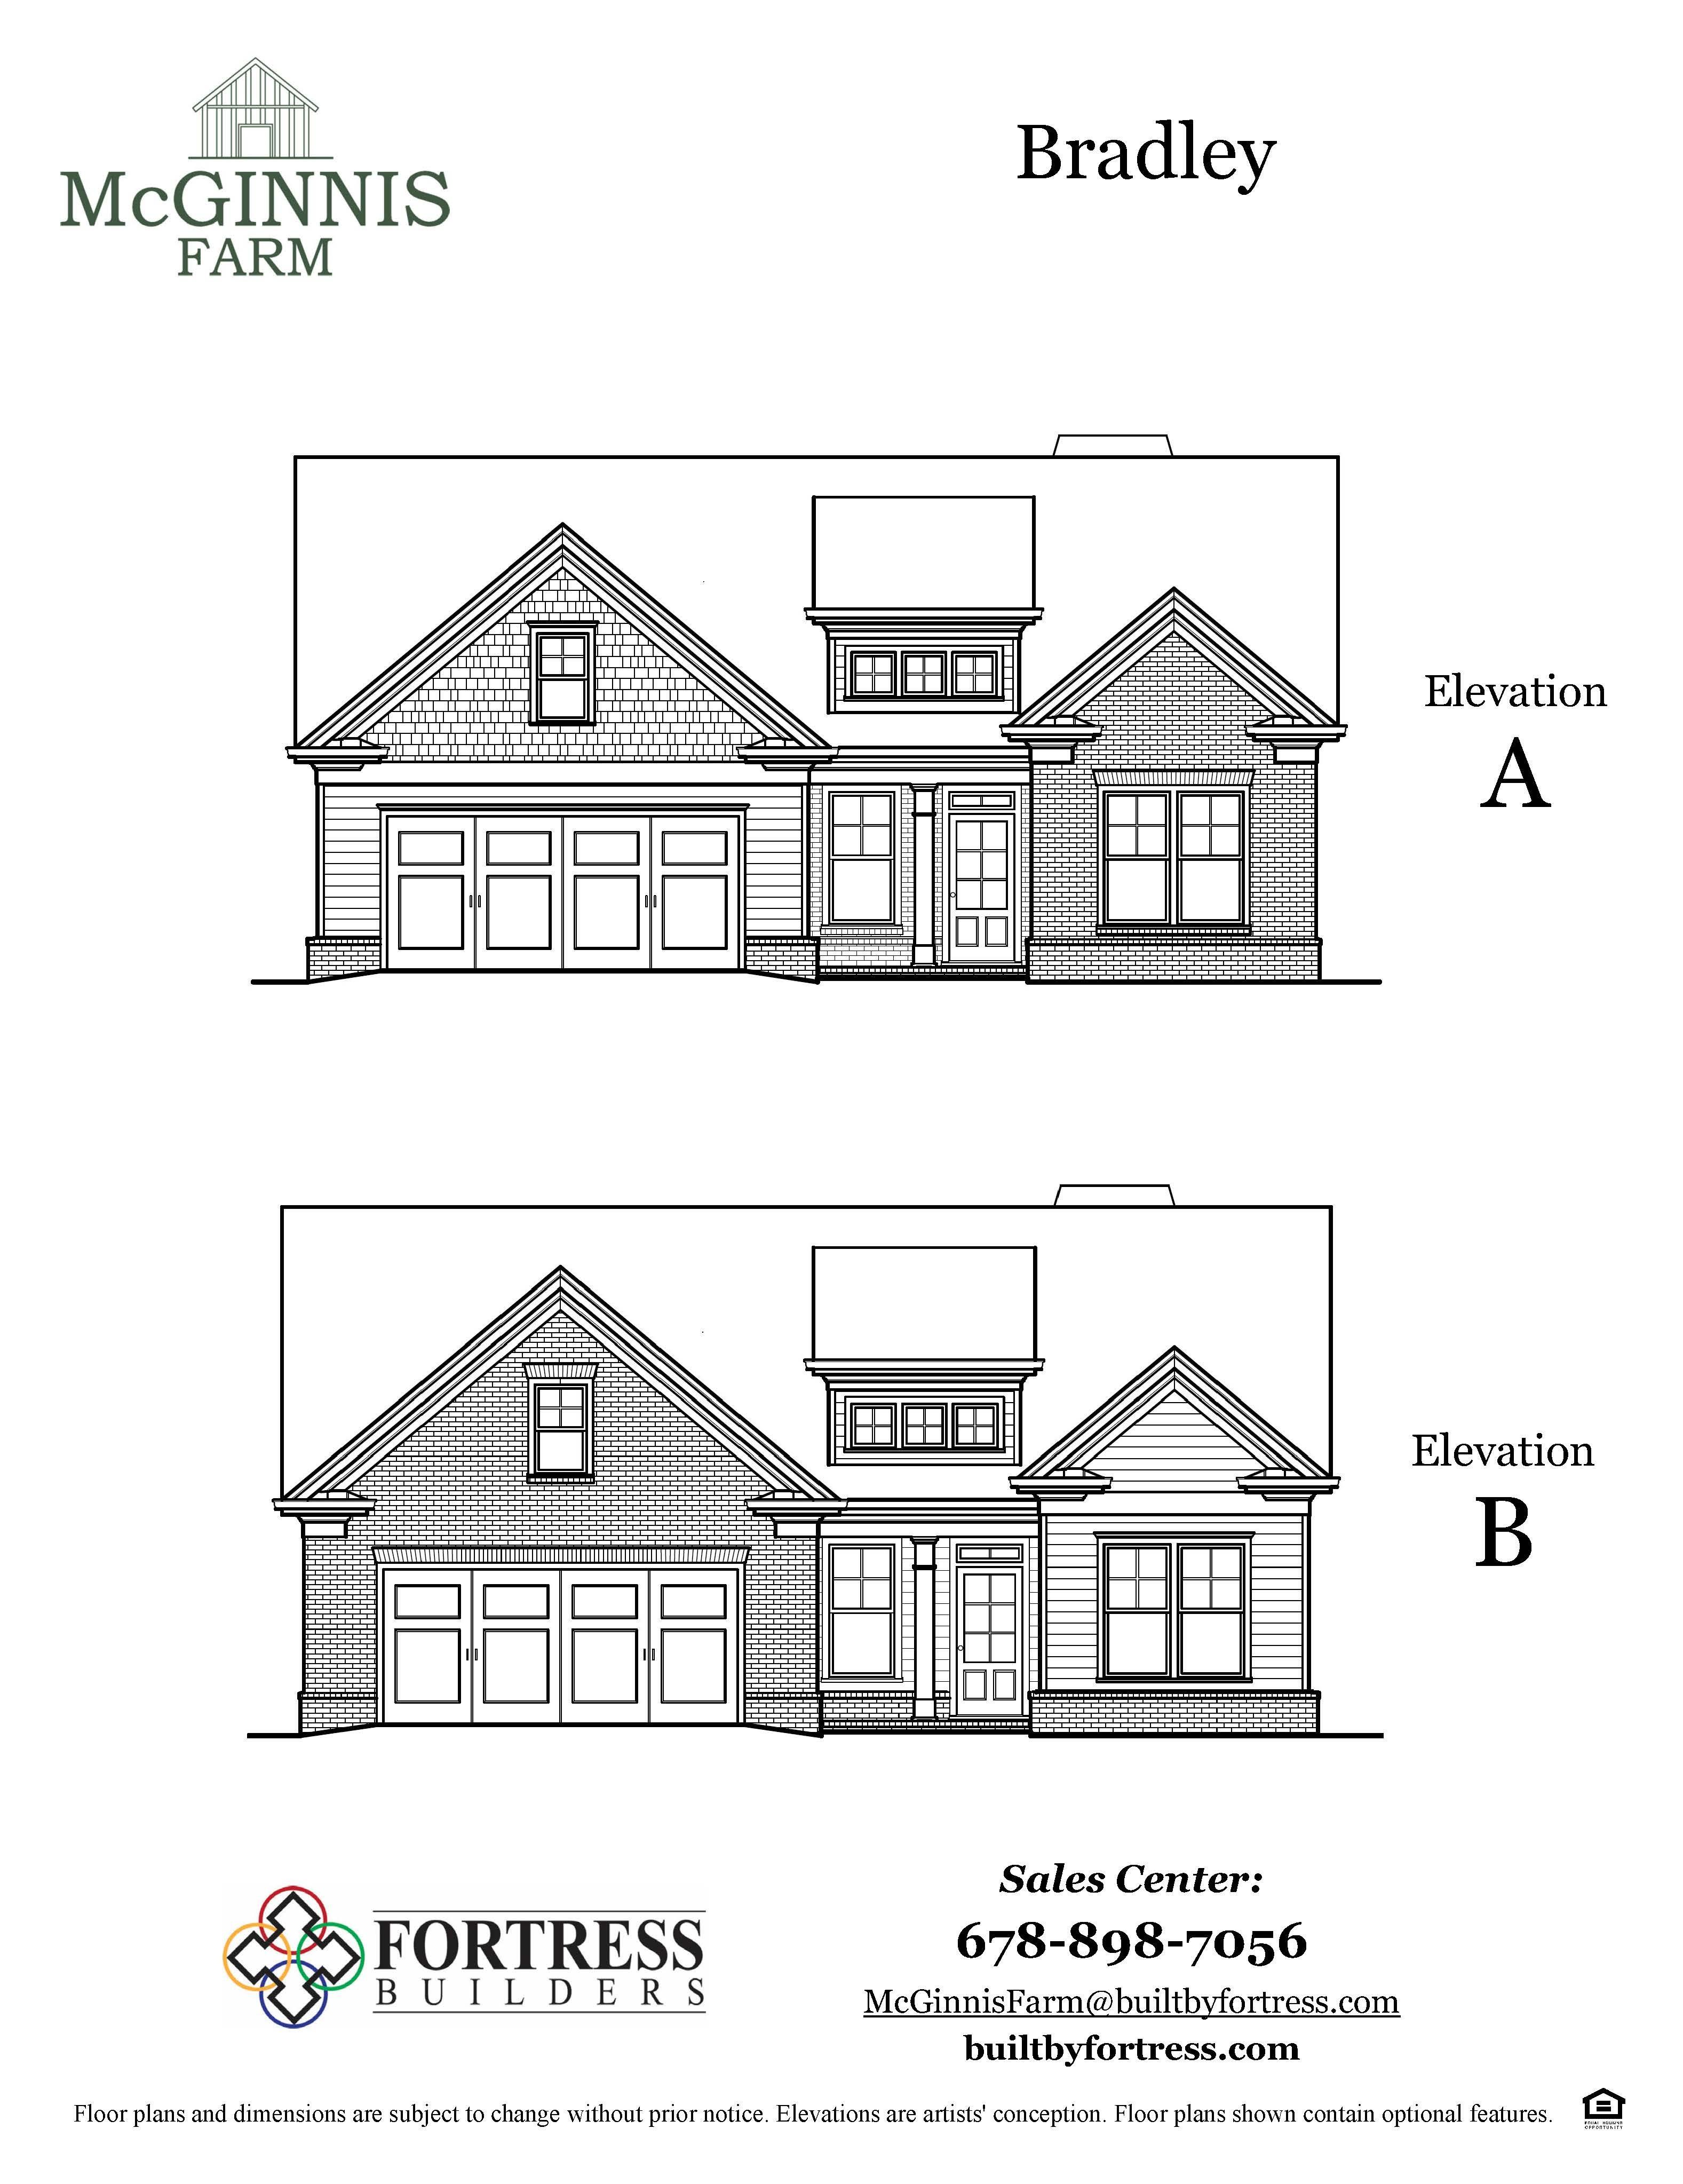 McGinnis Farm Floor Plans_Page_1.jpg